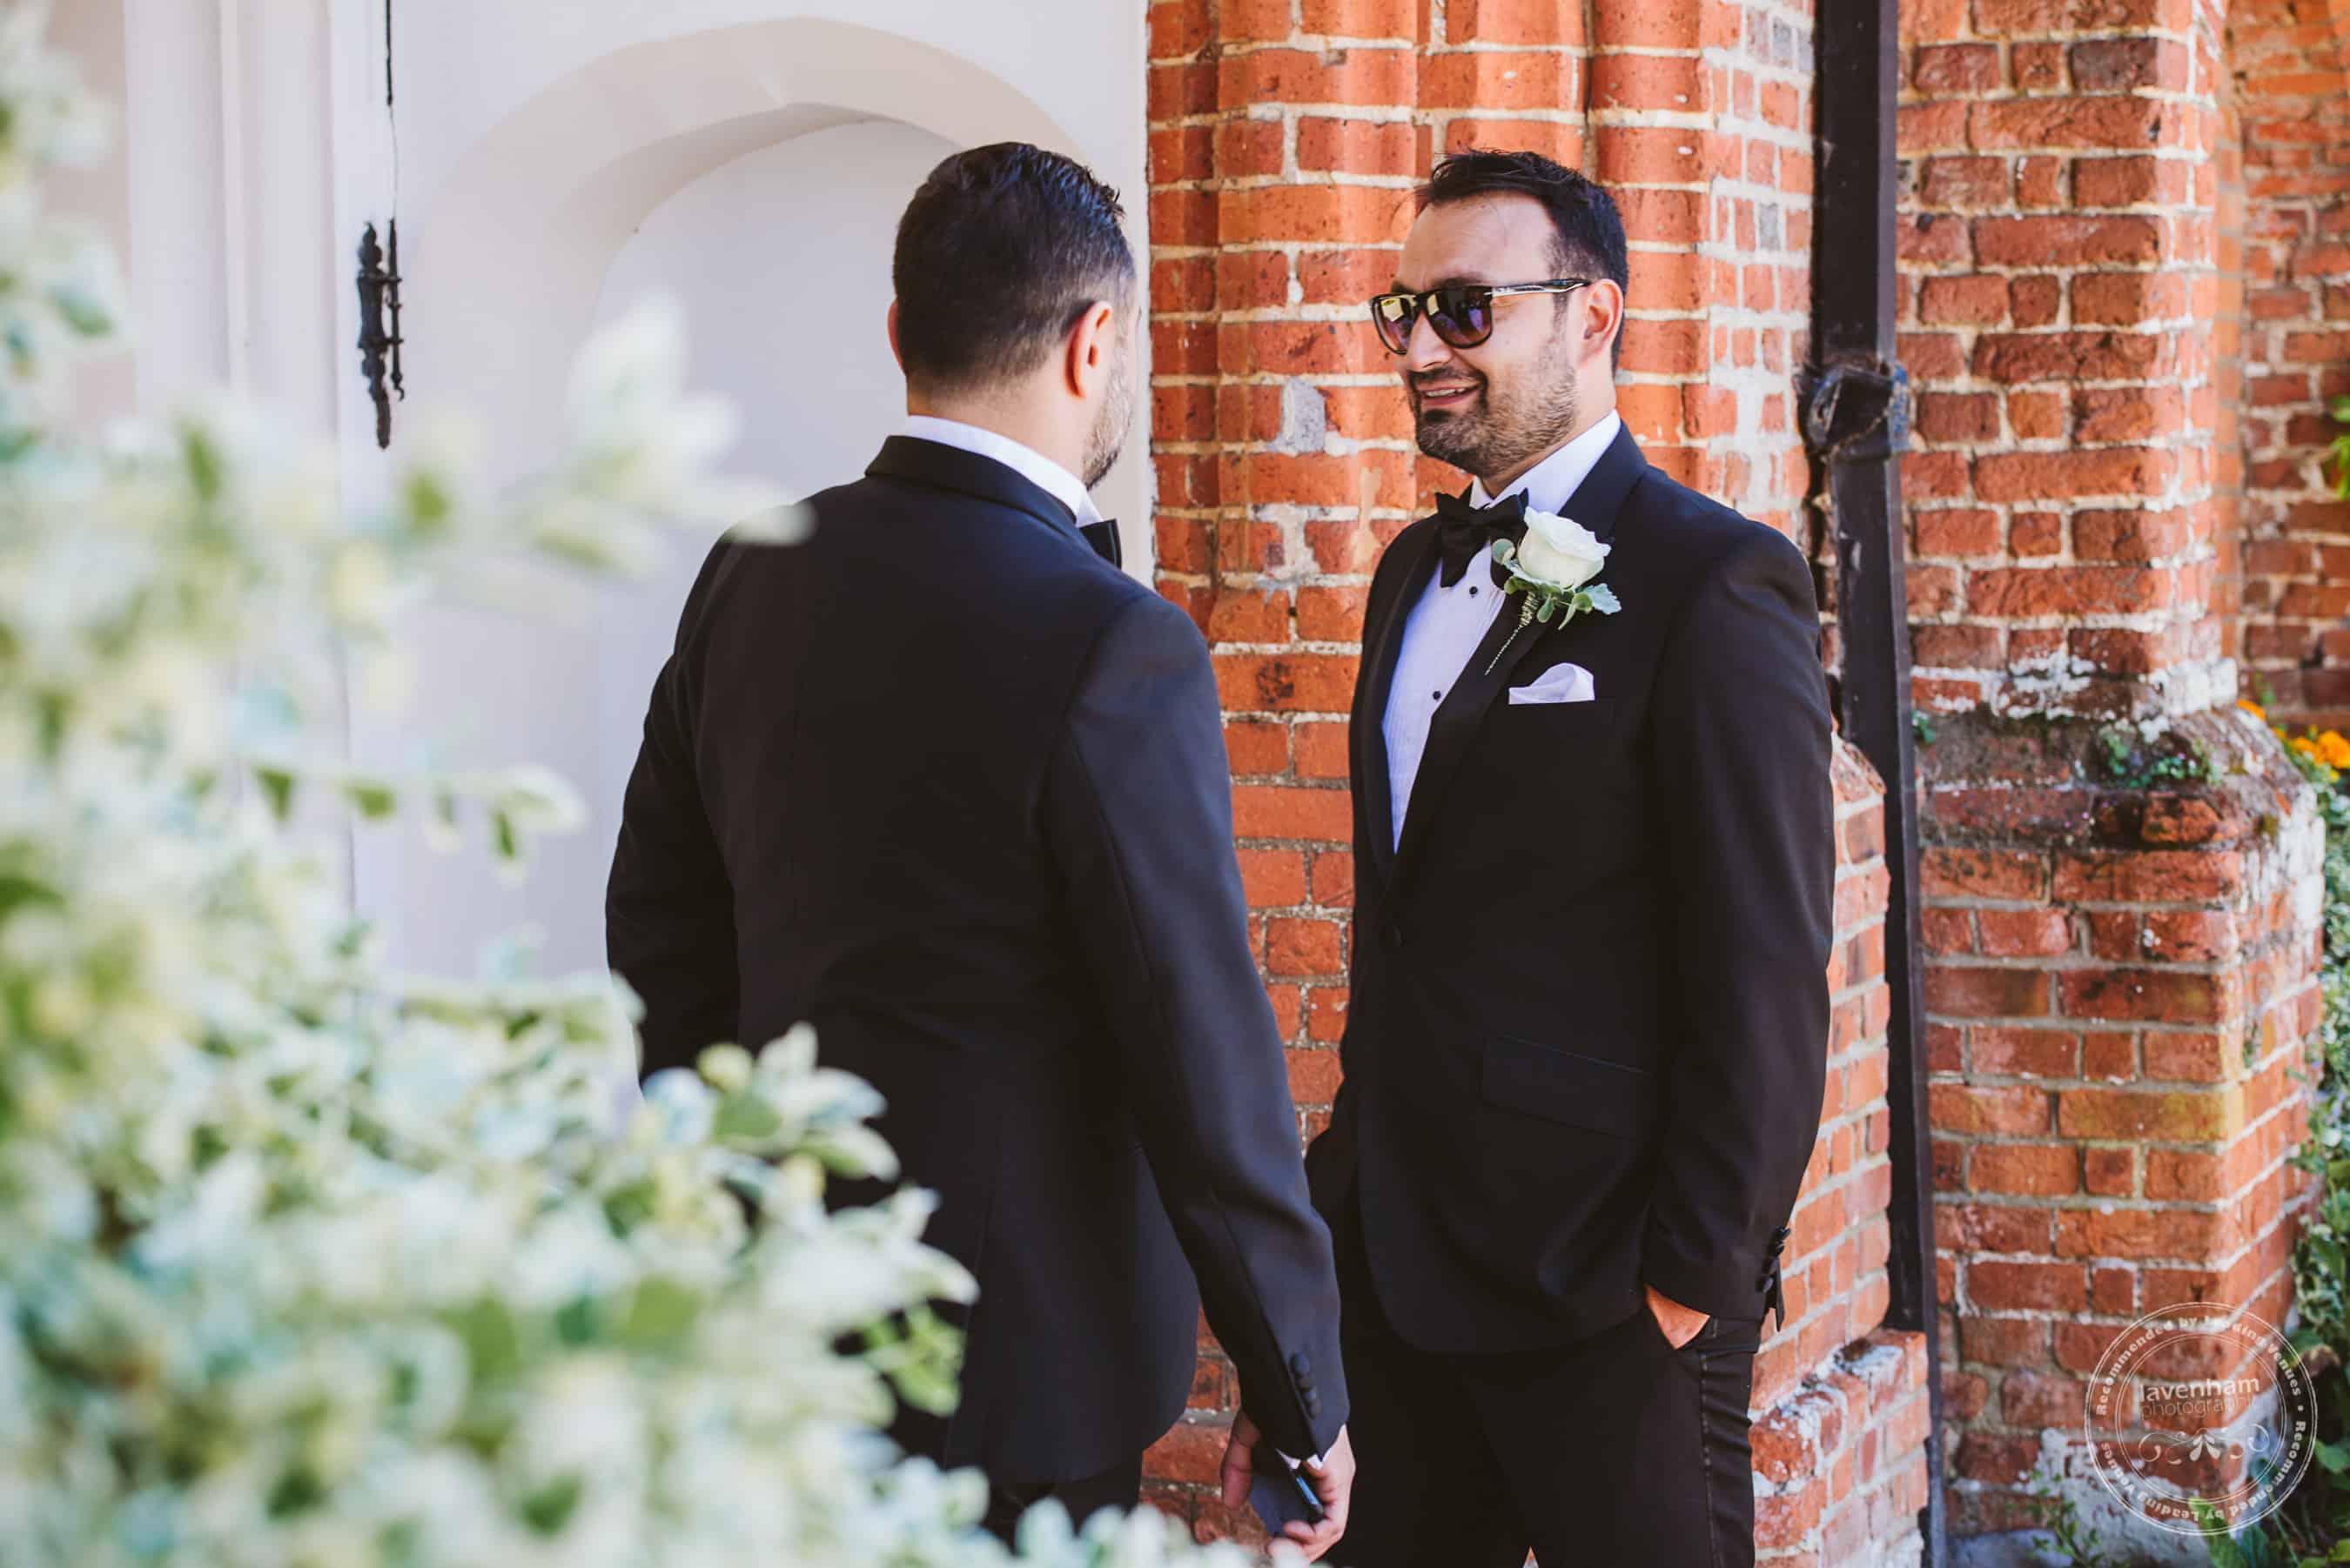 220618 Gosfield Hall Wedding Photography Lavenham Photographic 0060